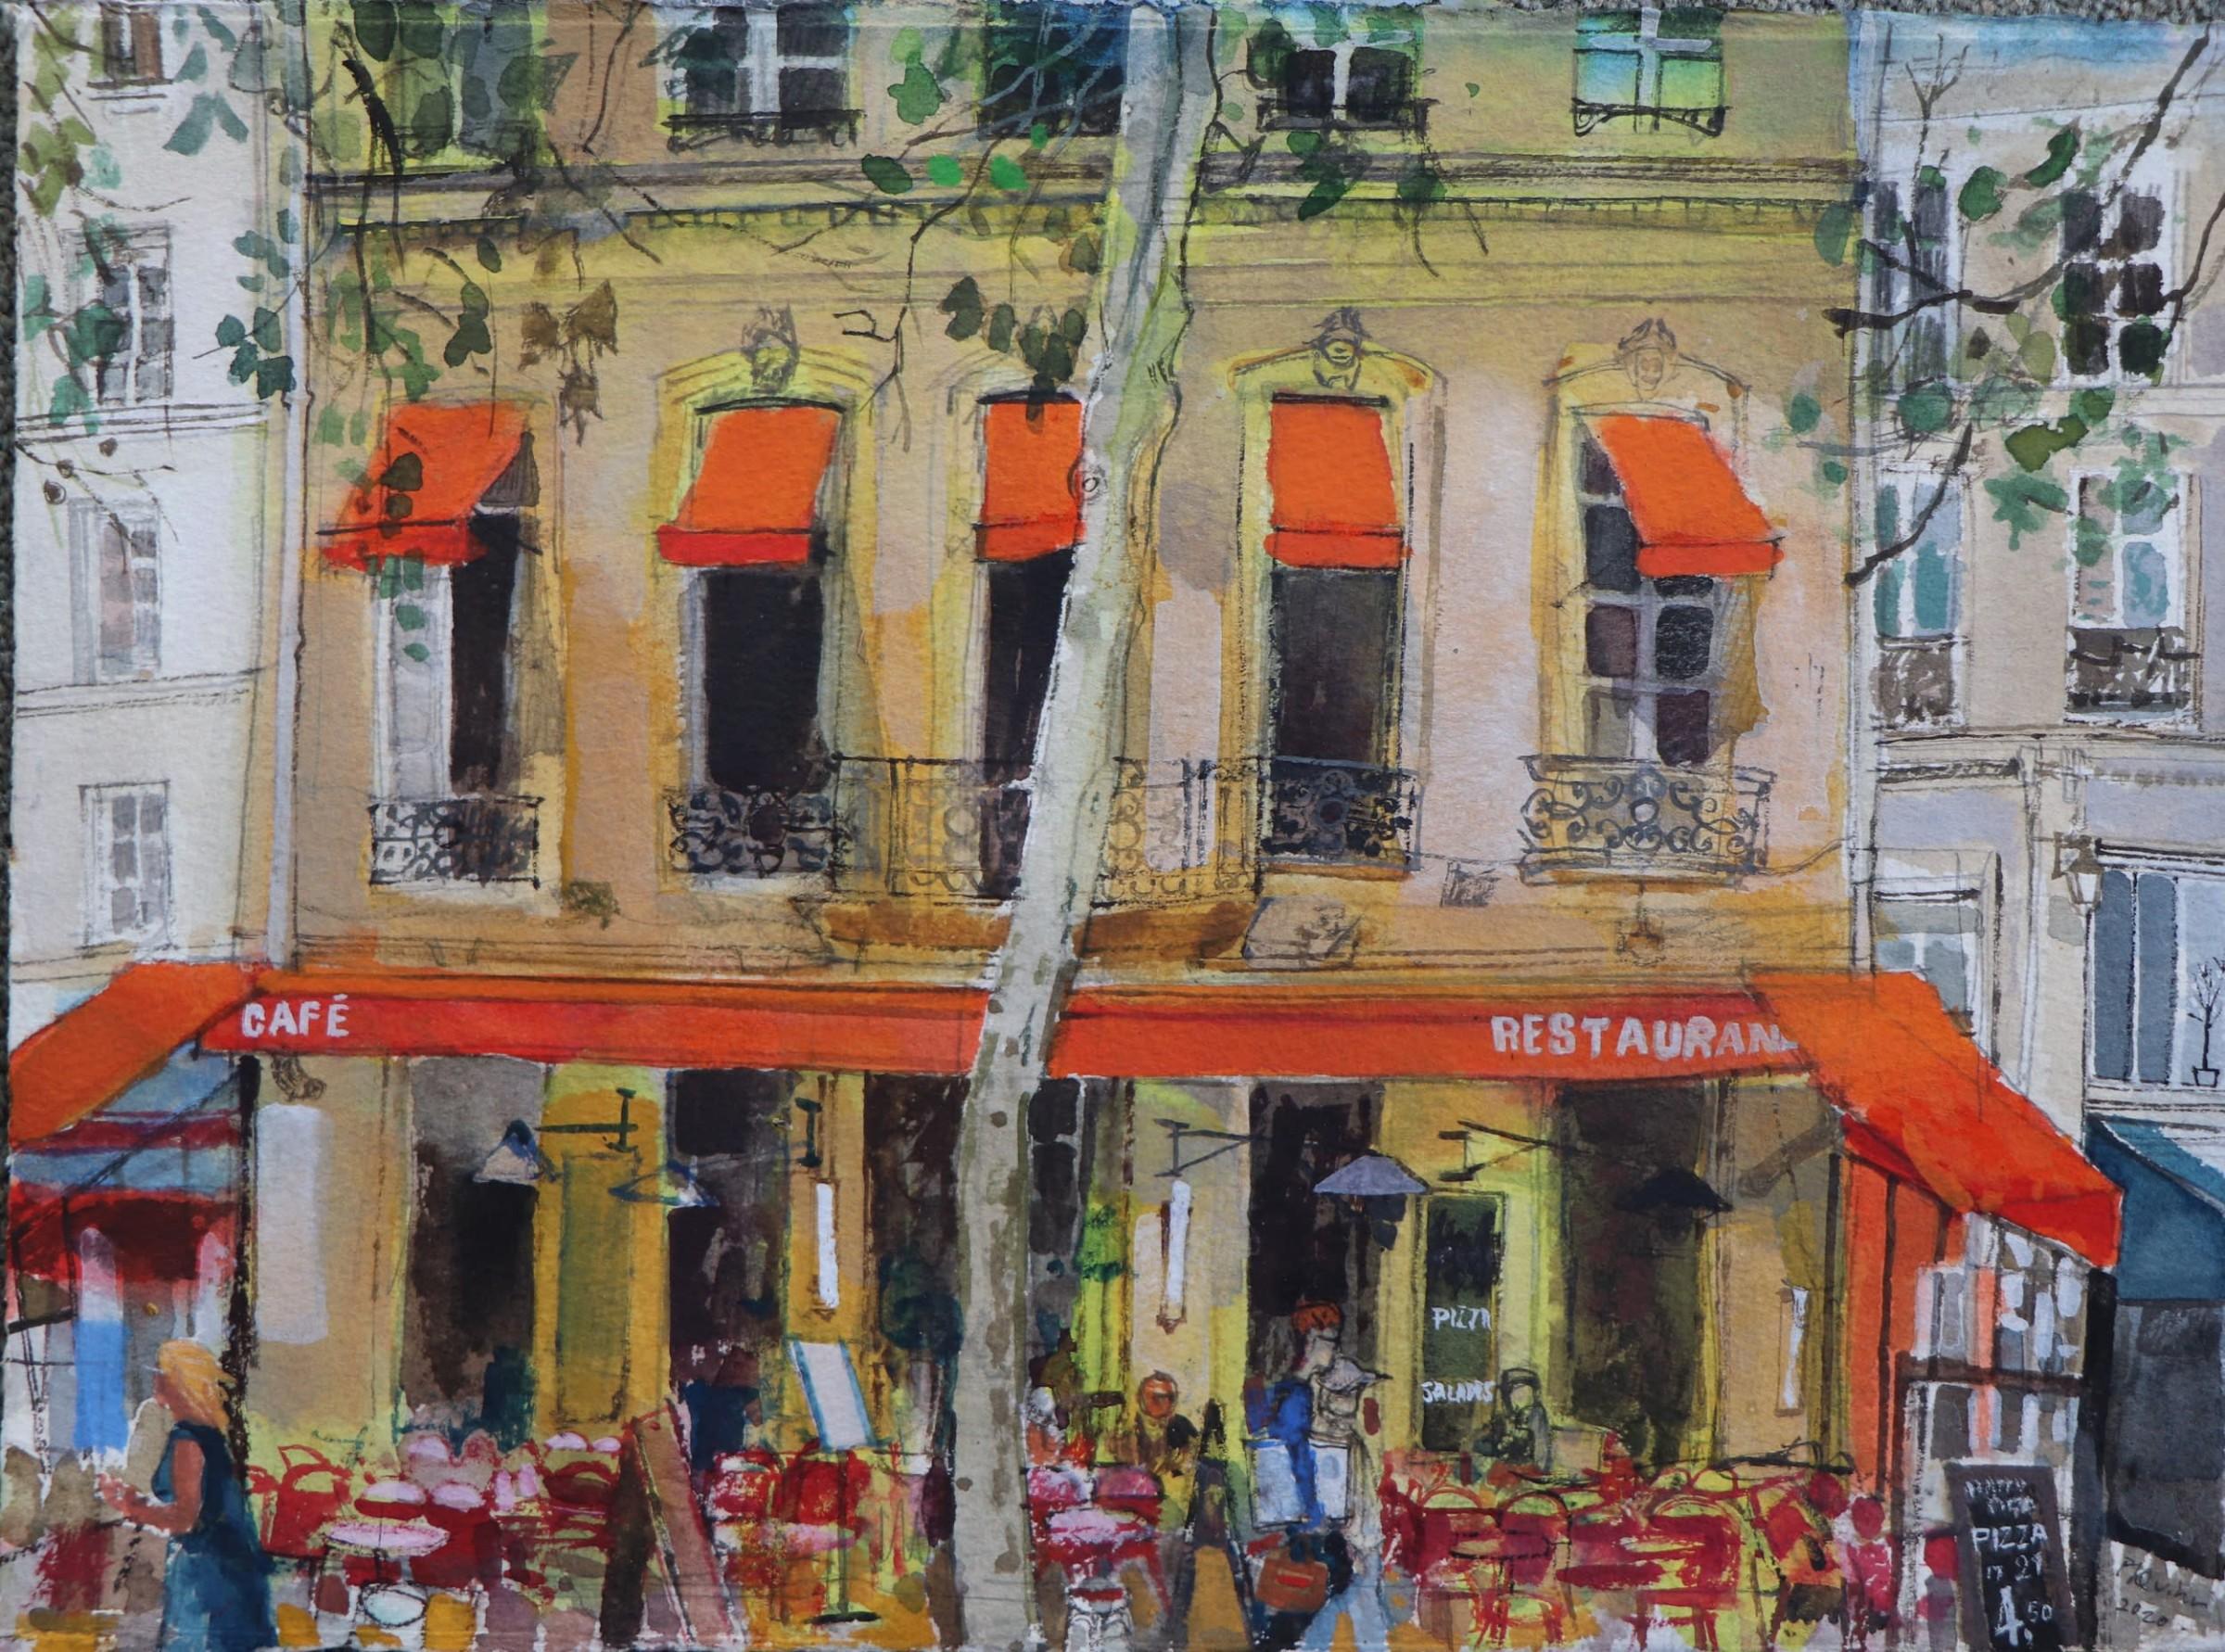 "<span class=""link fancybox-details-link""><a href=""/artists/96-peter-quinn/works/12656-peter-quinn-cafe-restaurant-paris/"">View Detail Page</a></span><div class=""artist""><span class=""artist""><strong>Peter Quinn</strong></span></div><div class=""title""><em>Cafe Restaurant Paris</em></div><div class=""medium"">watercolour on paper</div><div class=""dimensions"">Artwork: 38 x 28cm</div><div class=""price"">£625.00</div>"